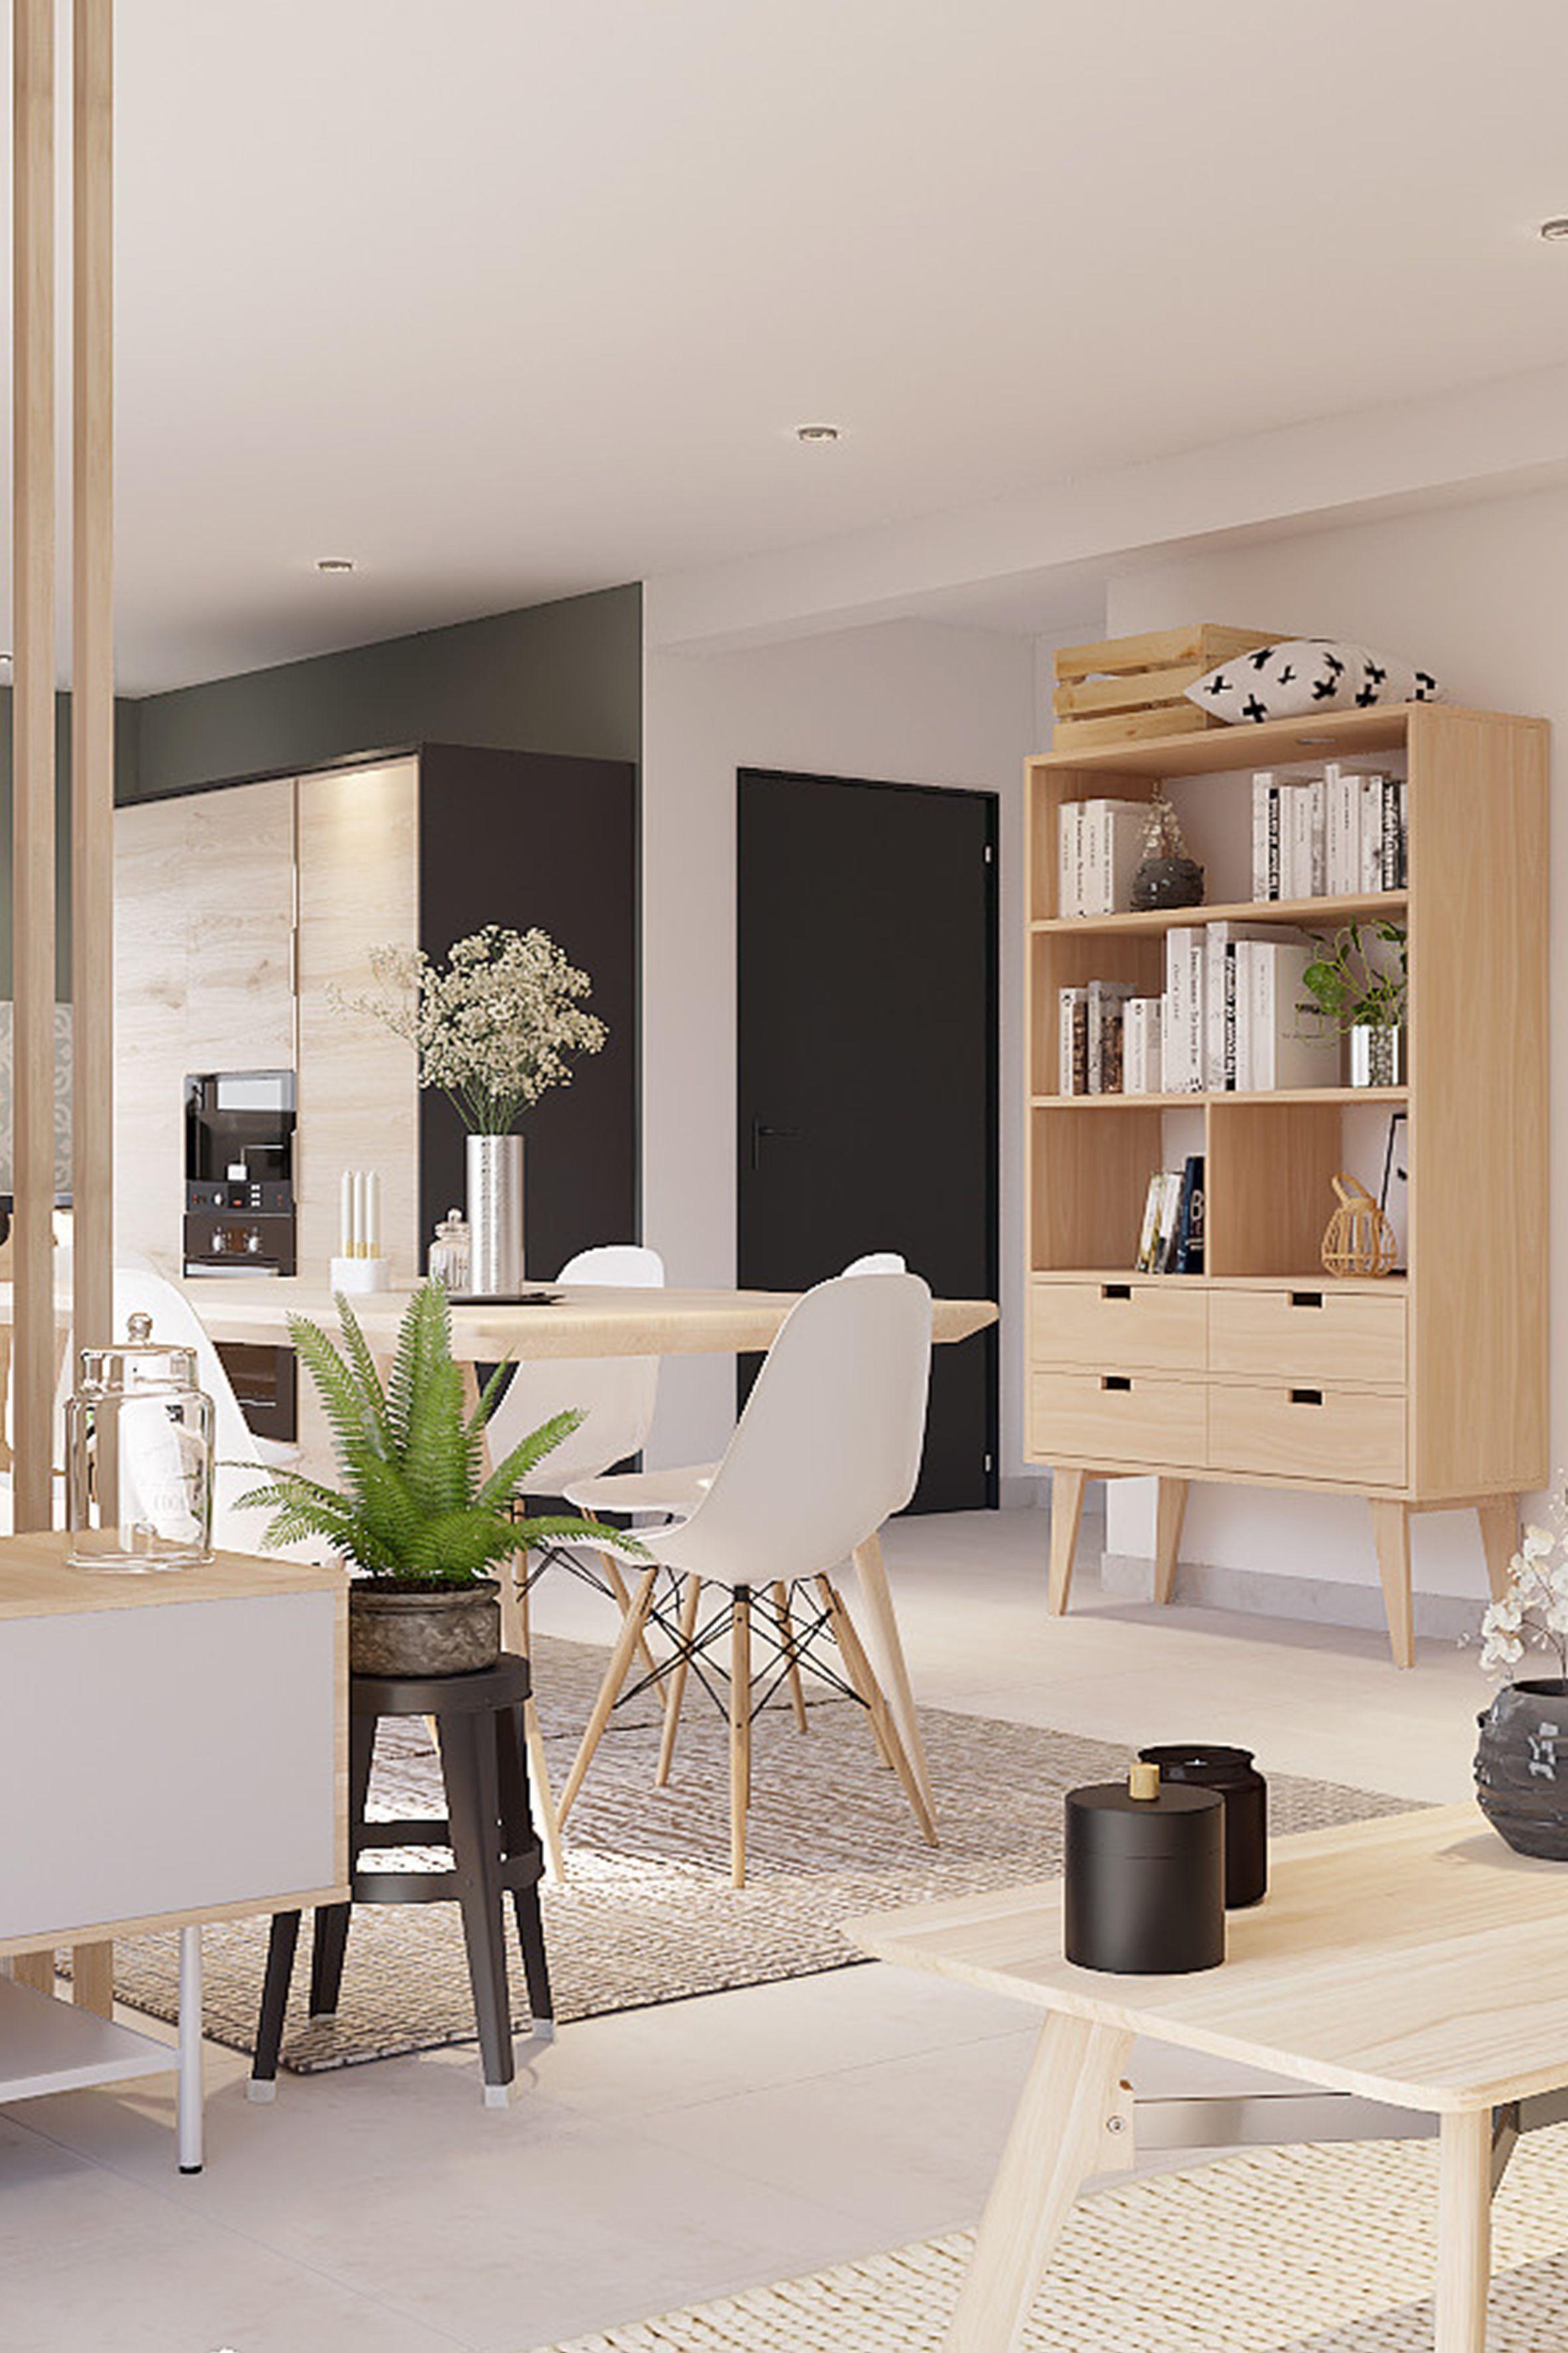 3d Interior Room Design: Home Decor, Interior Design